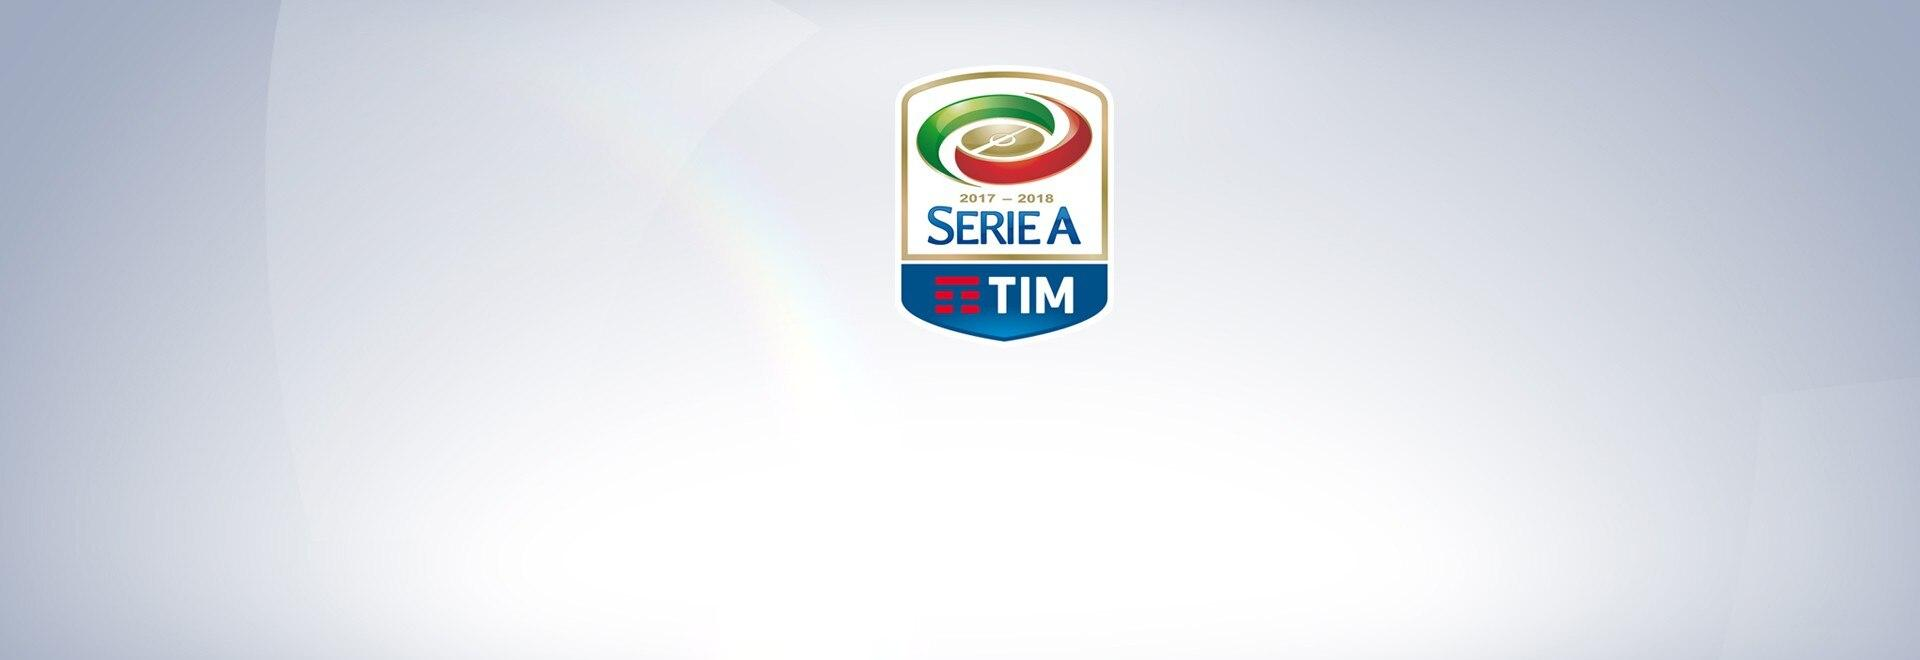 Chievo - Roma